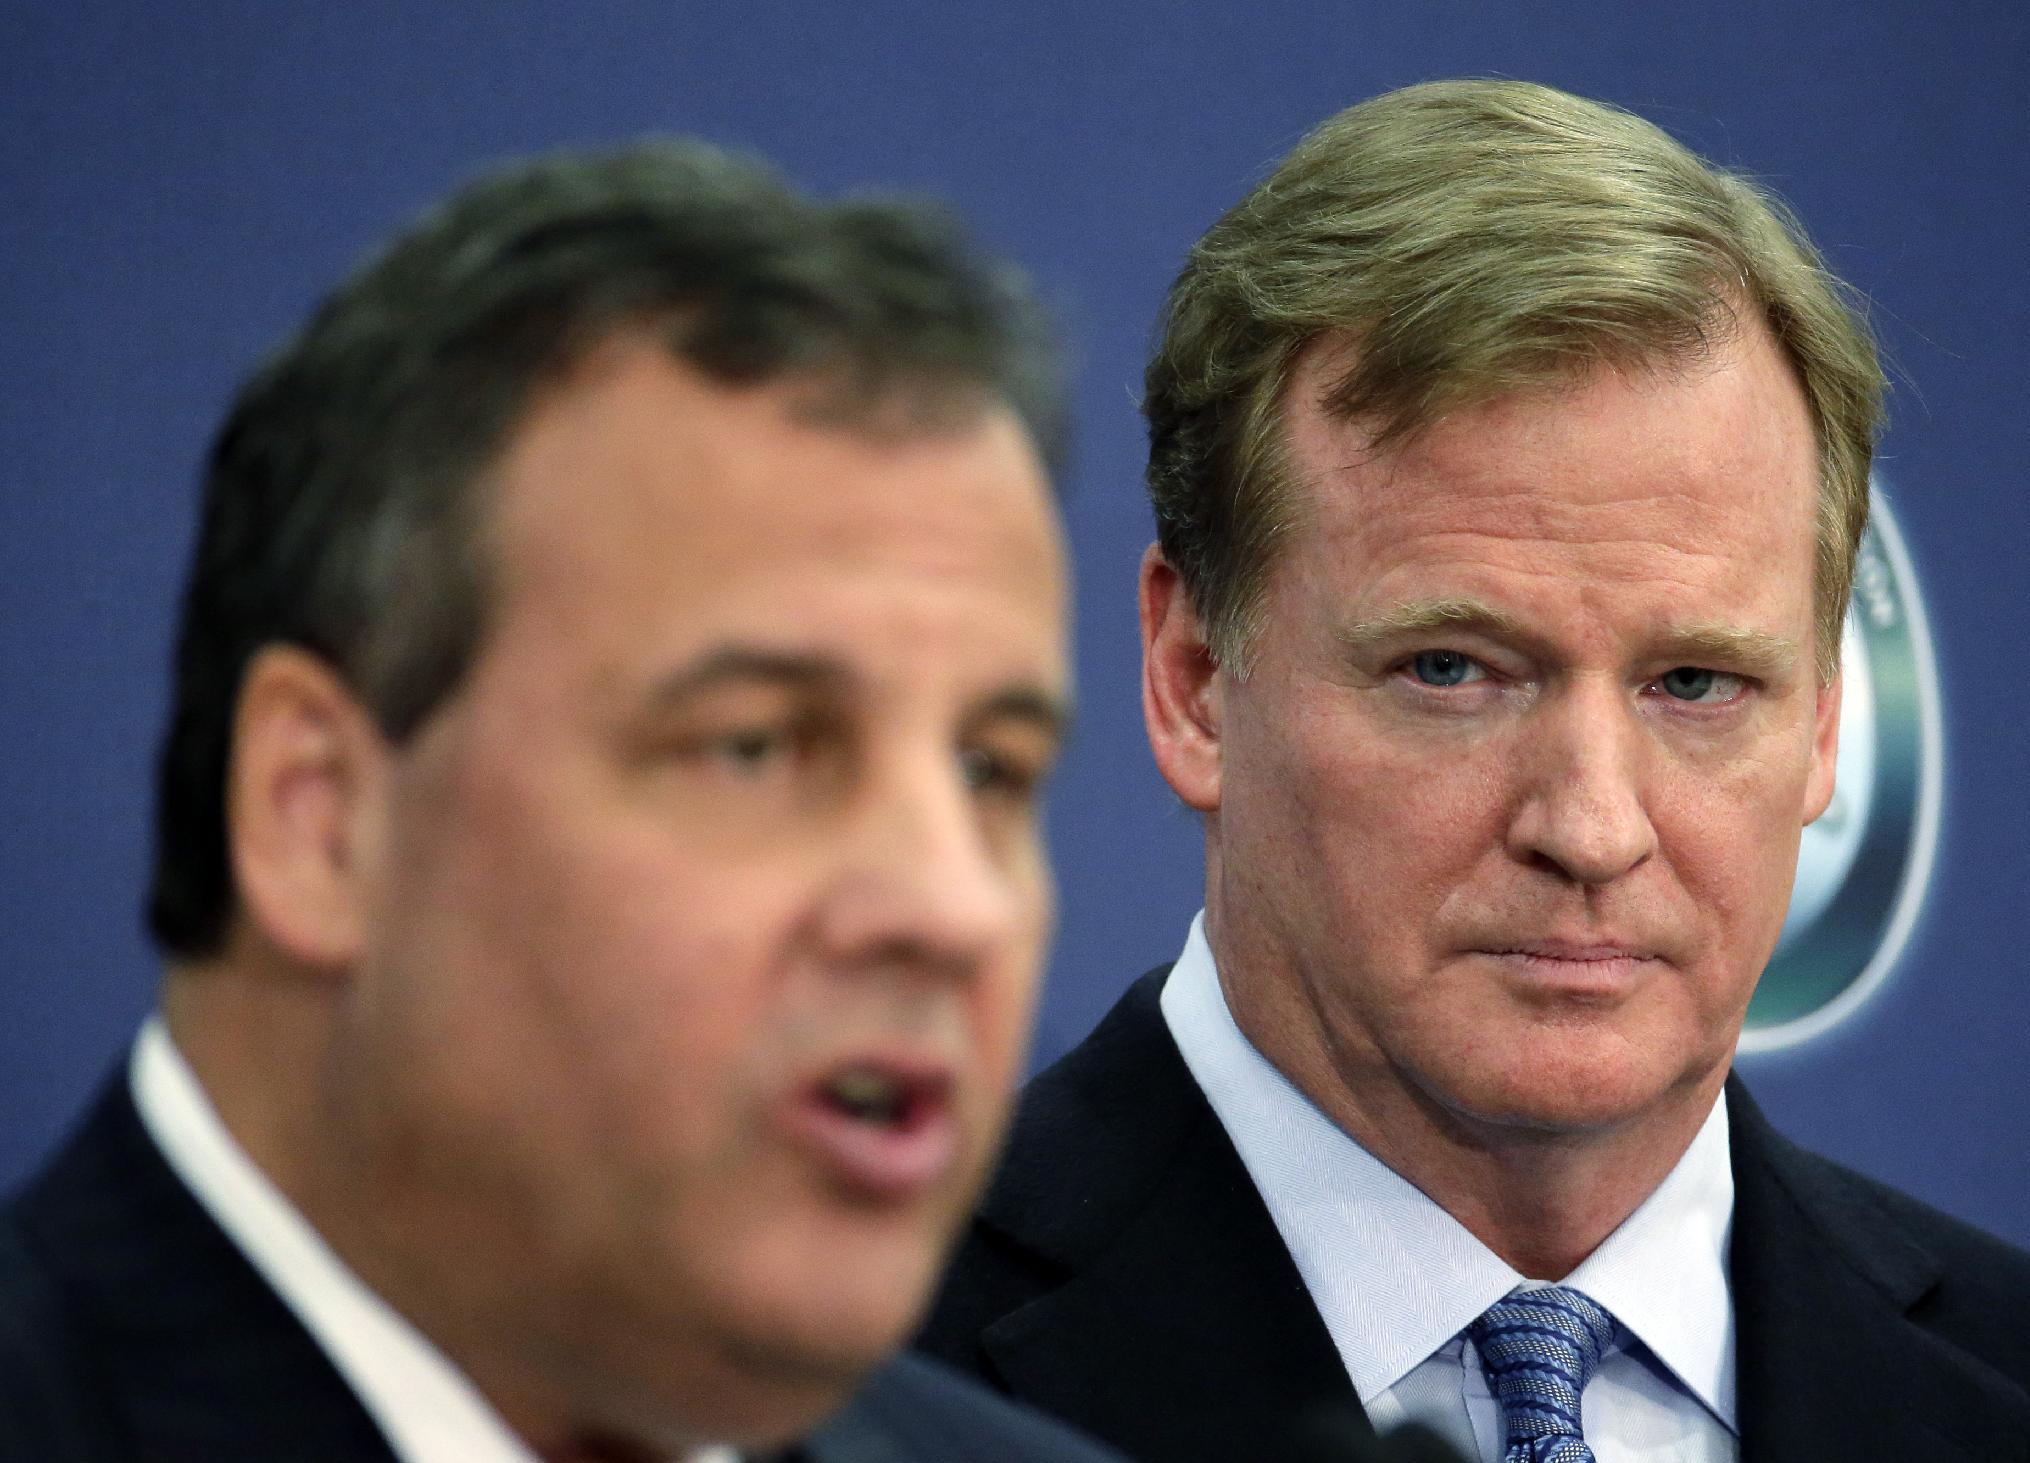 Gov. Christie on defense as NJ hosts Super Bowl